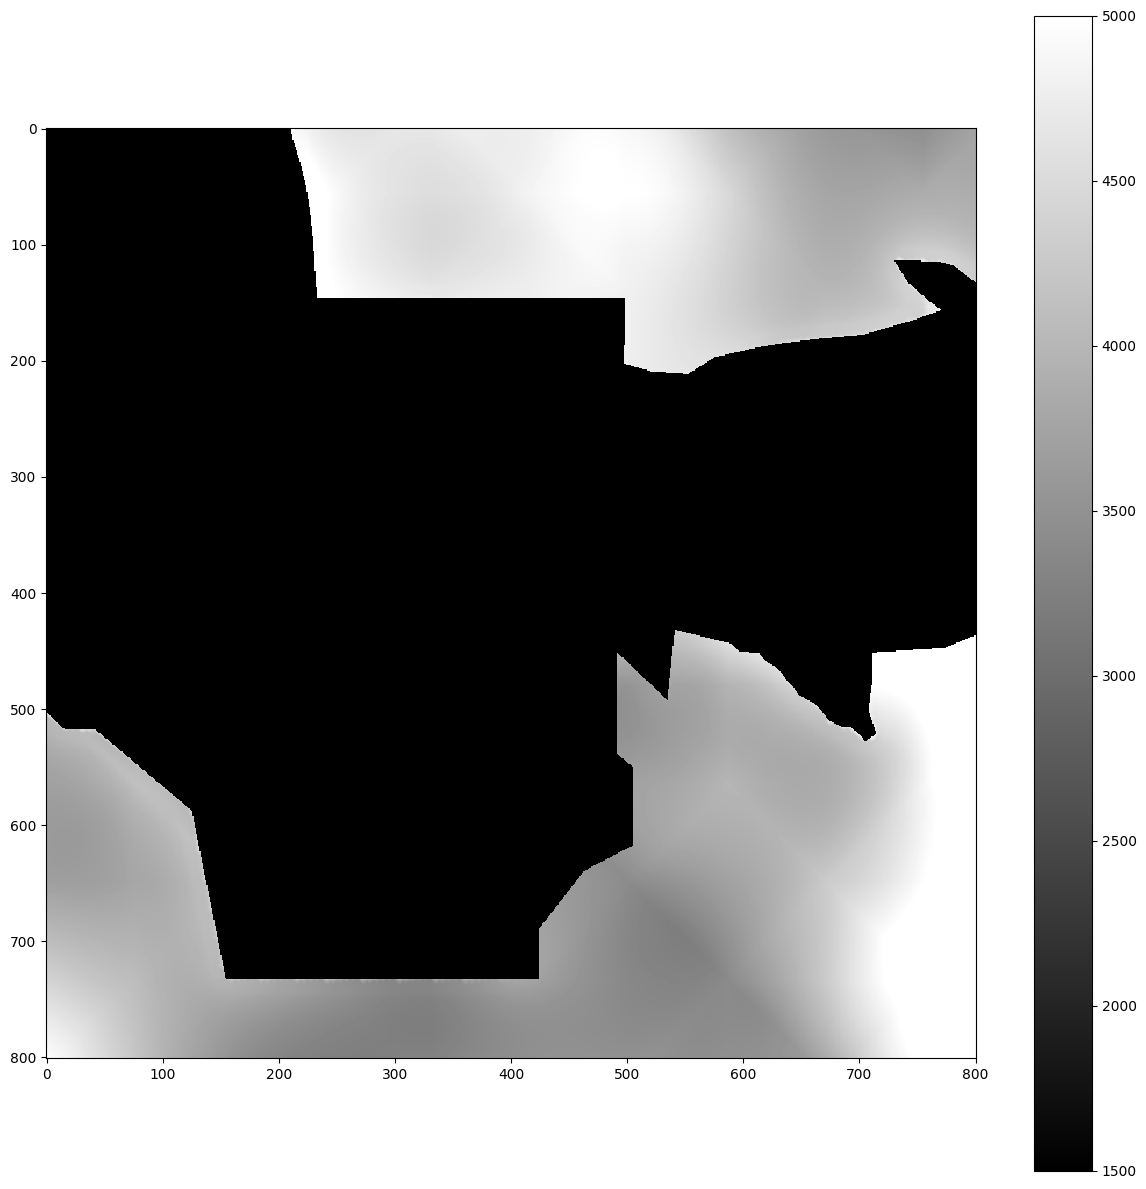 bench/seismic/wp/la_habra/meshes/velocity_model/plots/vp_0.png